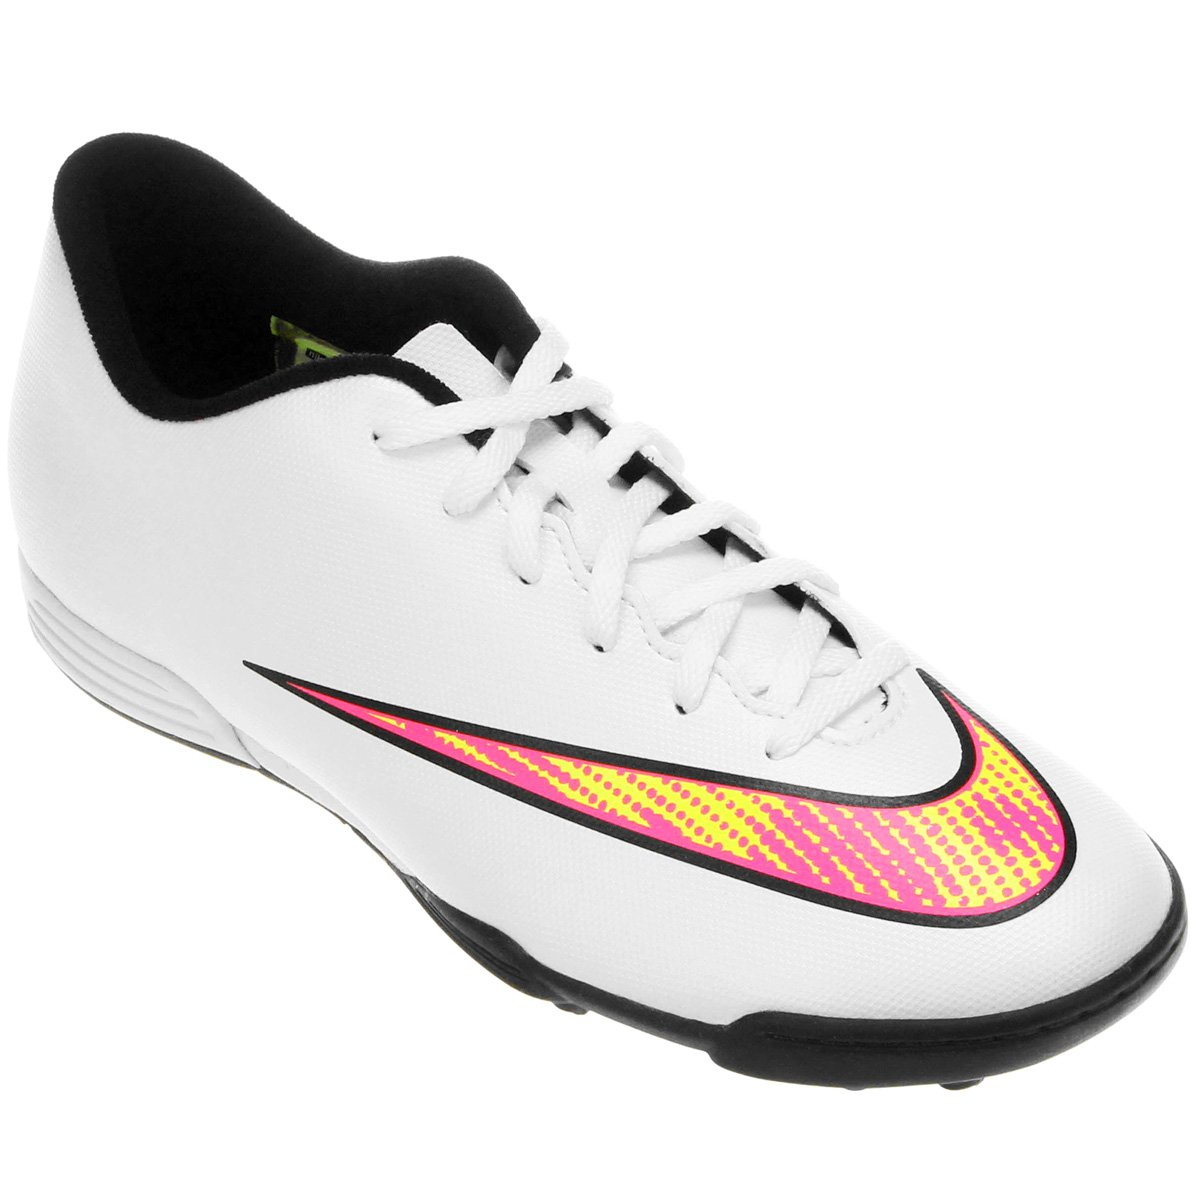 Chuteira Society Nike Mercurial Vortex 2 TF - Compre Agora  adddd0e6f45b6